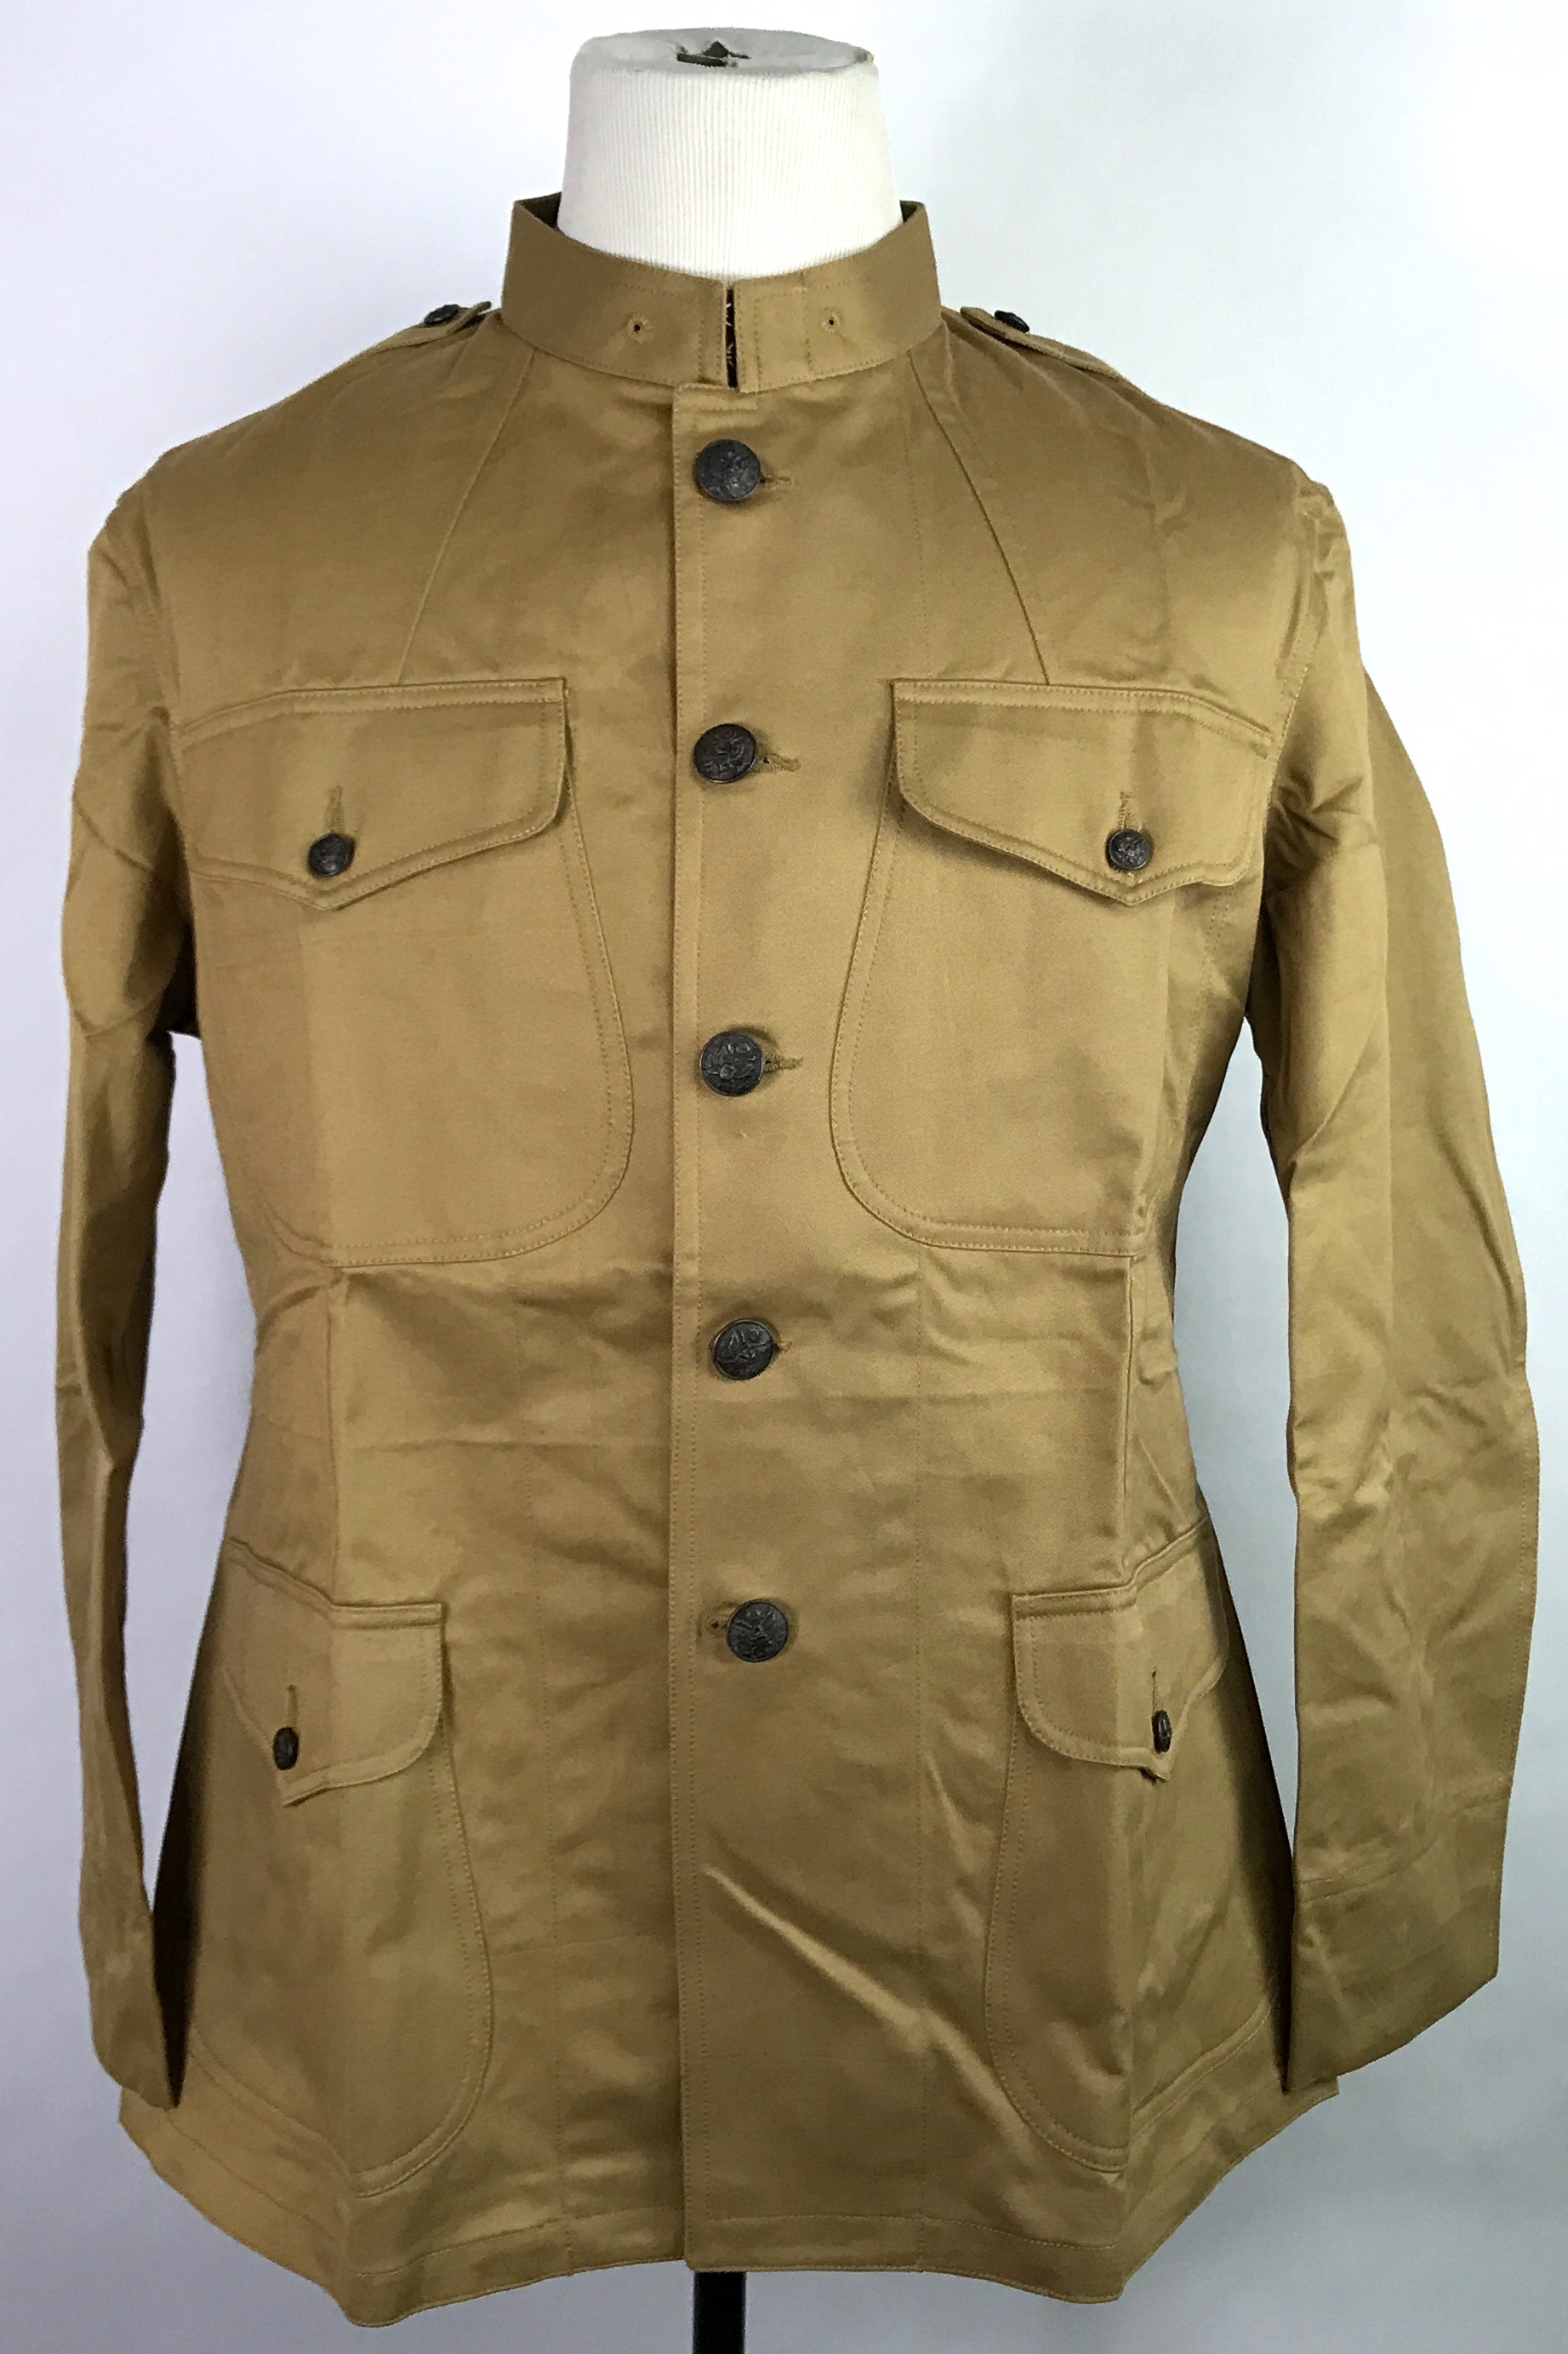 Leather Jacket Restoration